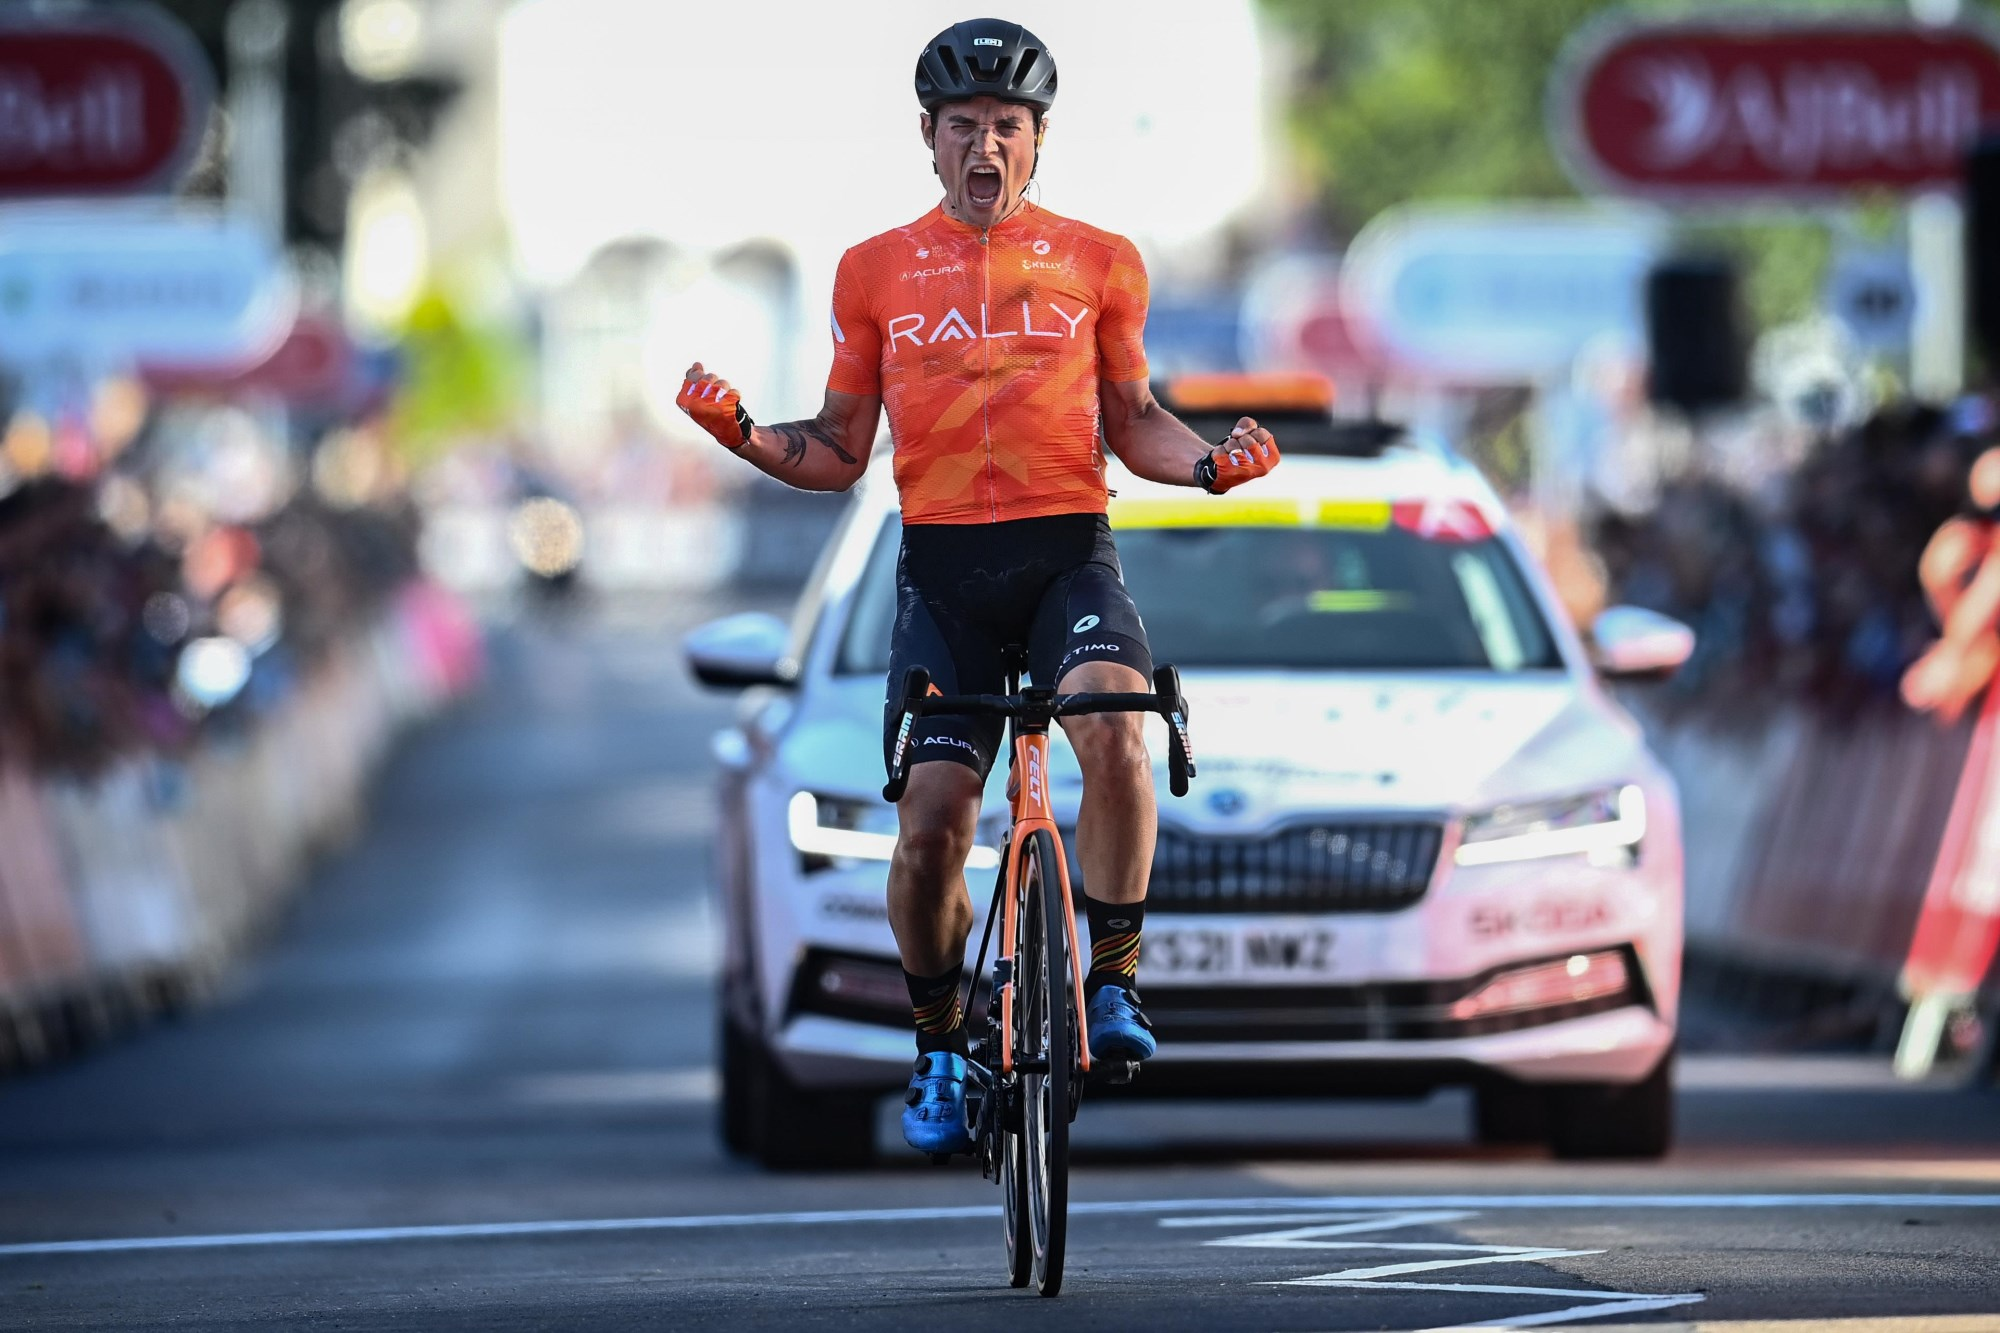 Robin Carpenter vence etapa 2 e é o novo líder do Tour of Britain!